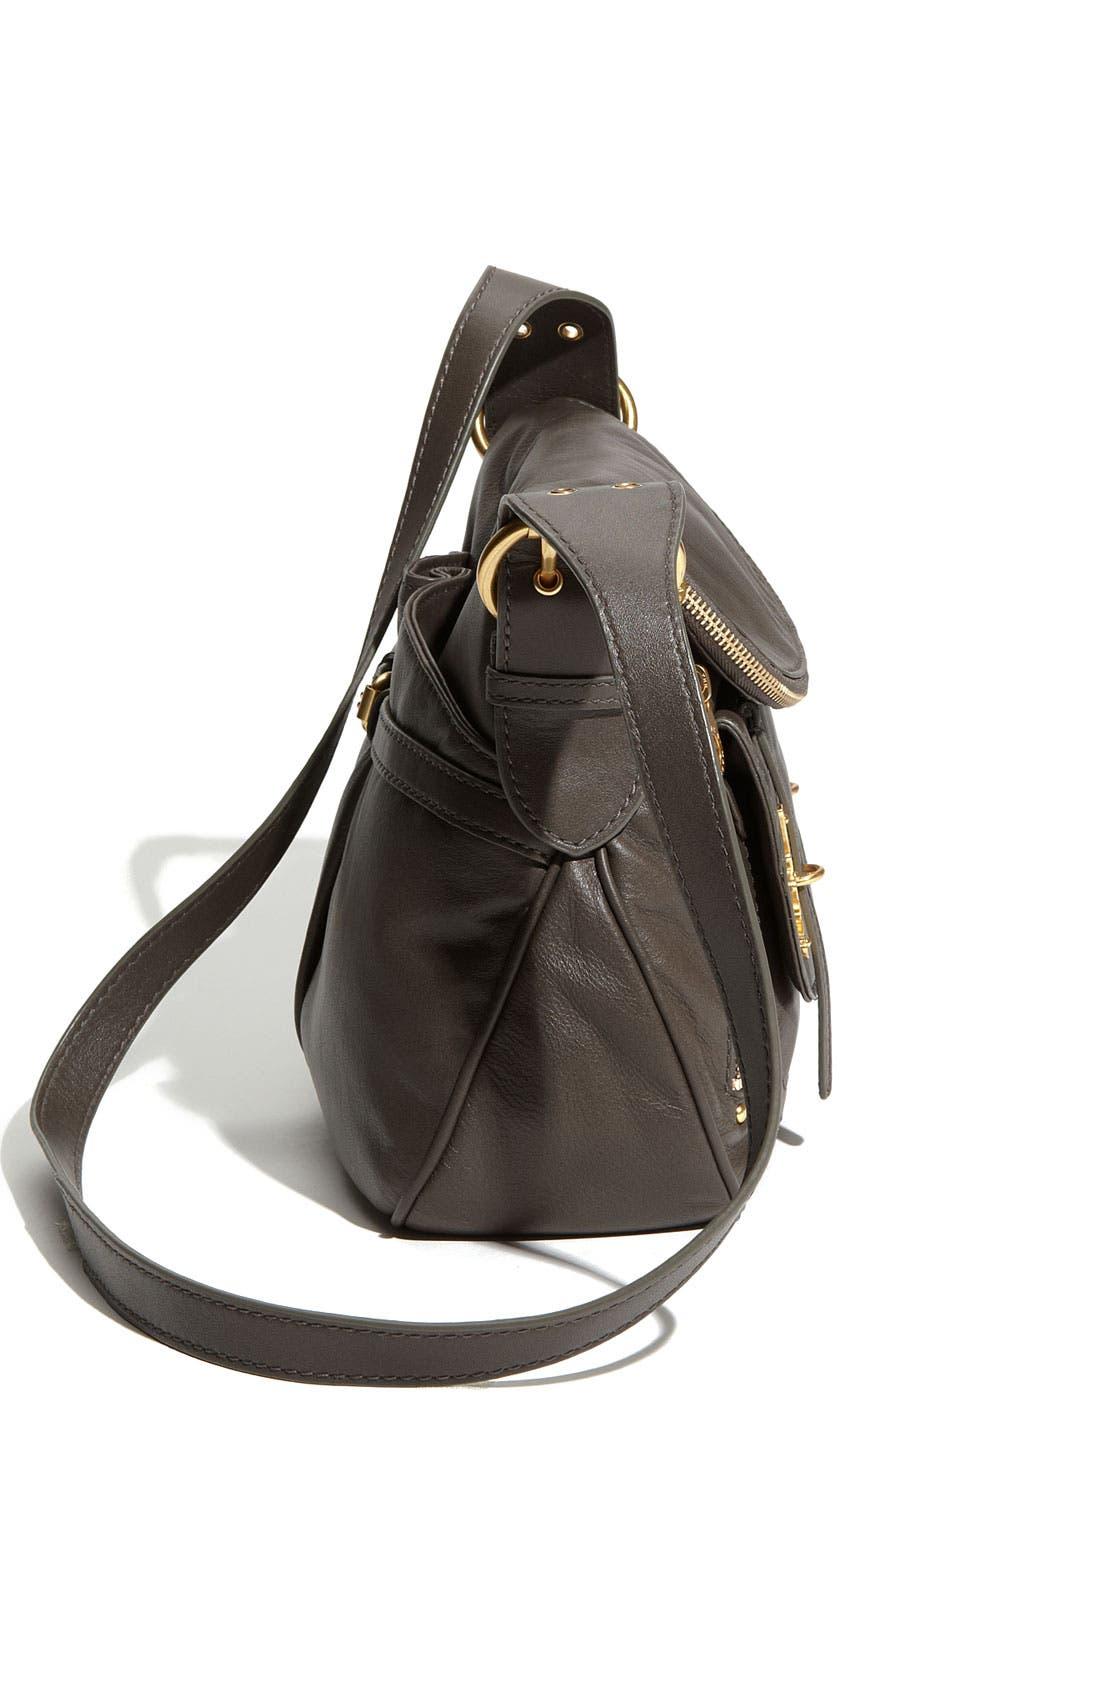 ,                             MARC BY MARC JACOBS 'Petal to the Metal - Natasha' Flap Crossbody Bag, Medium,                             Alternate thumbnail 20, color,                             052